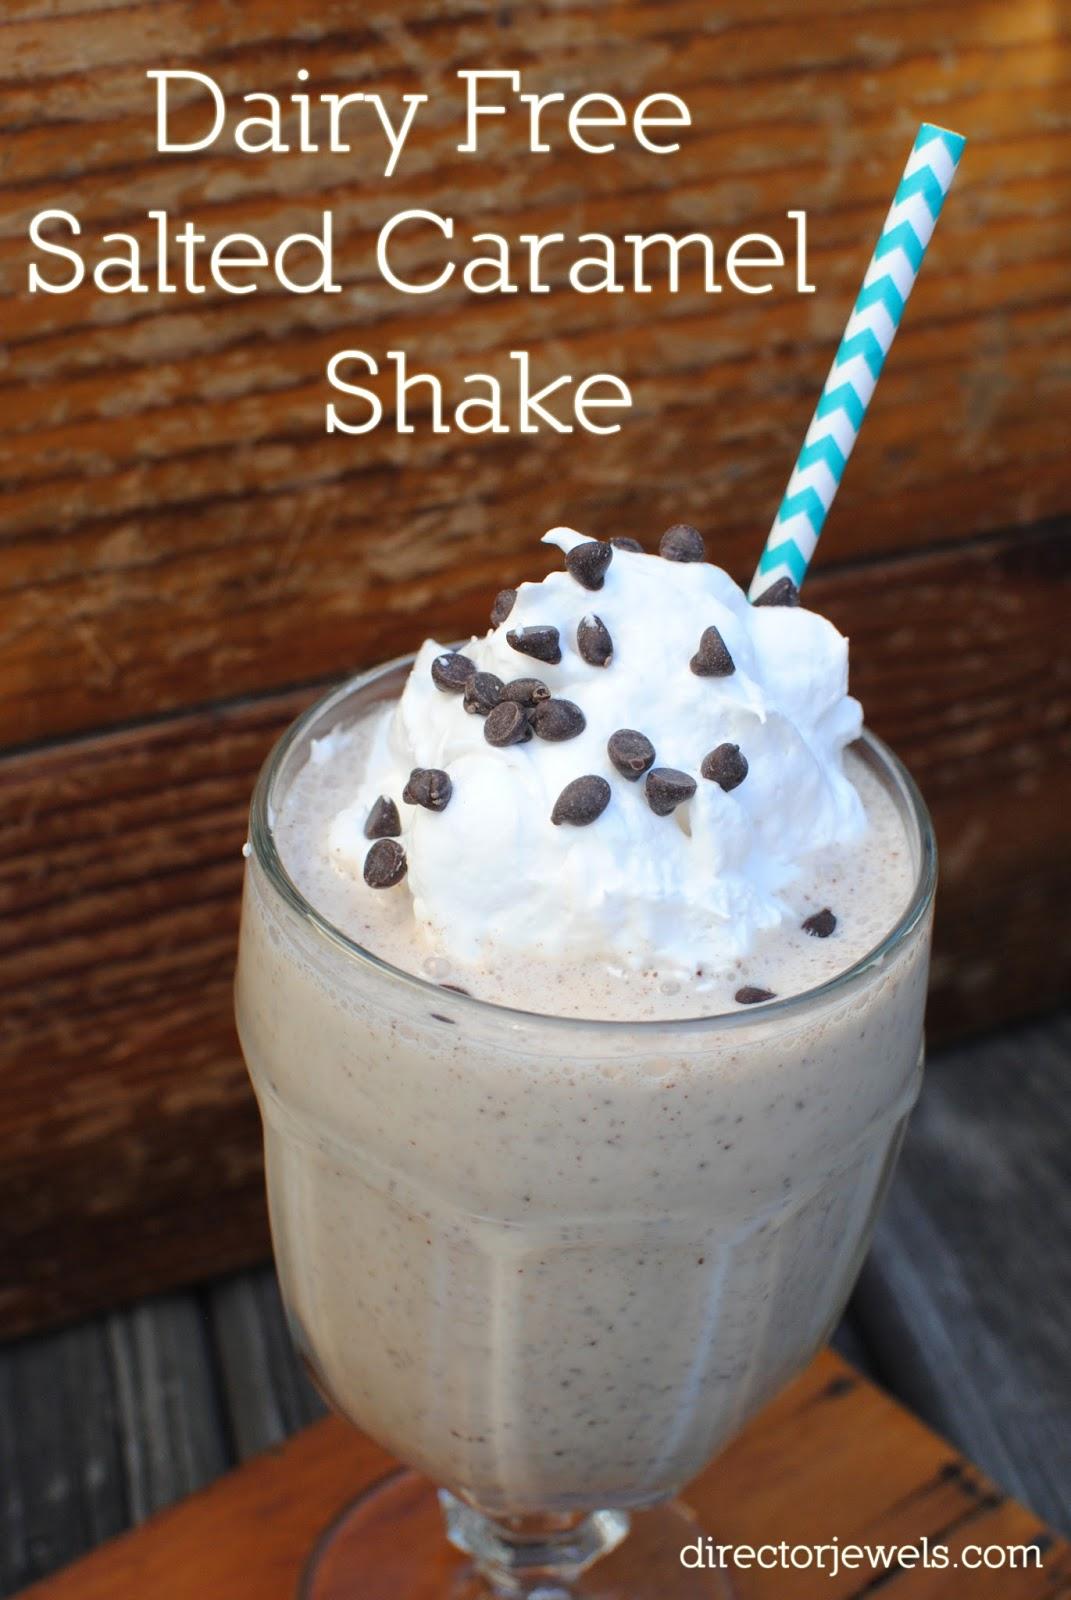 Director Jewels: Dairy Free Salted Caramel Shake